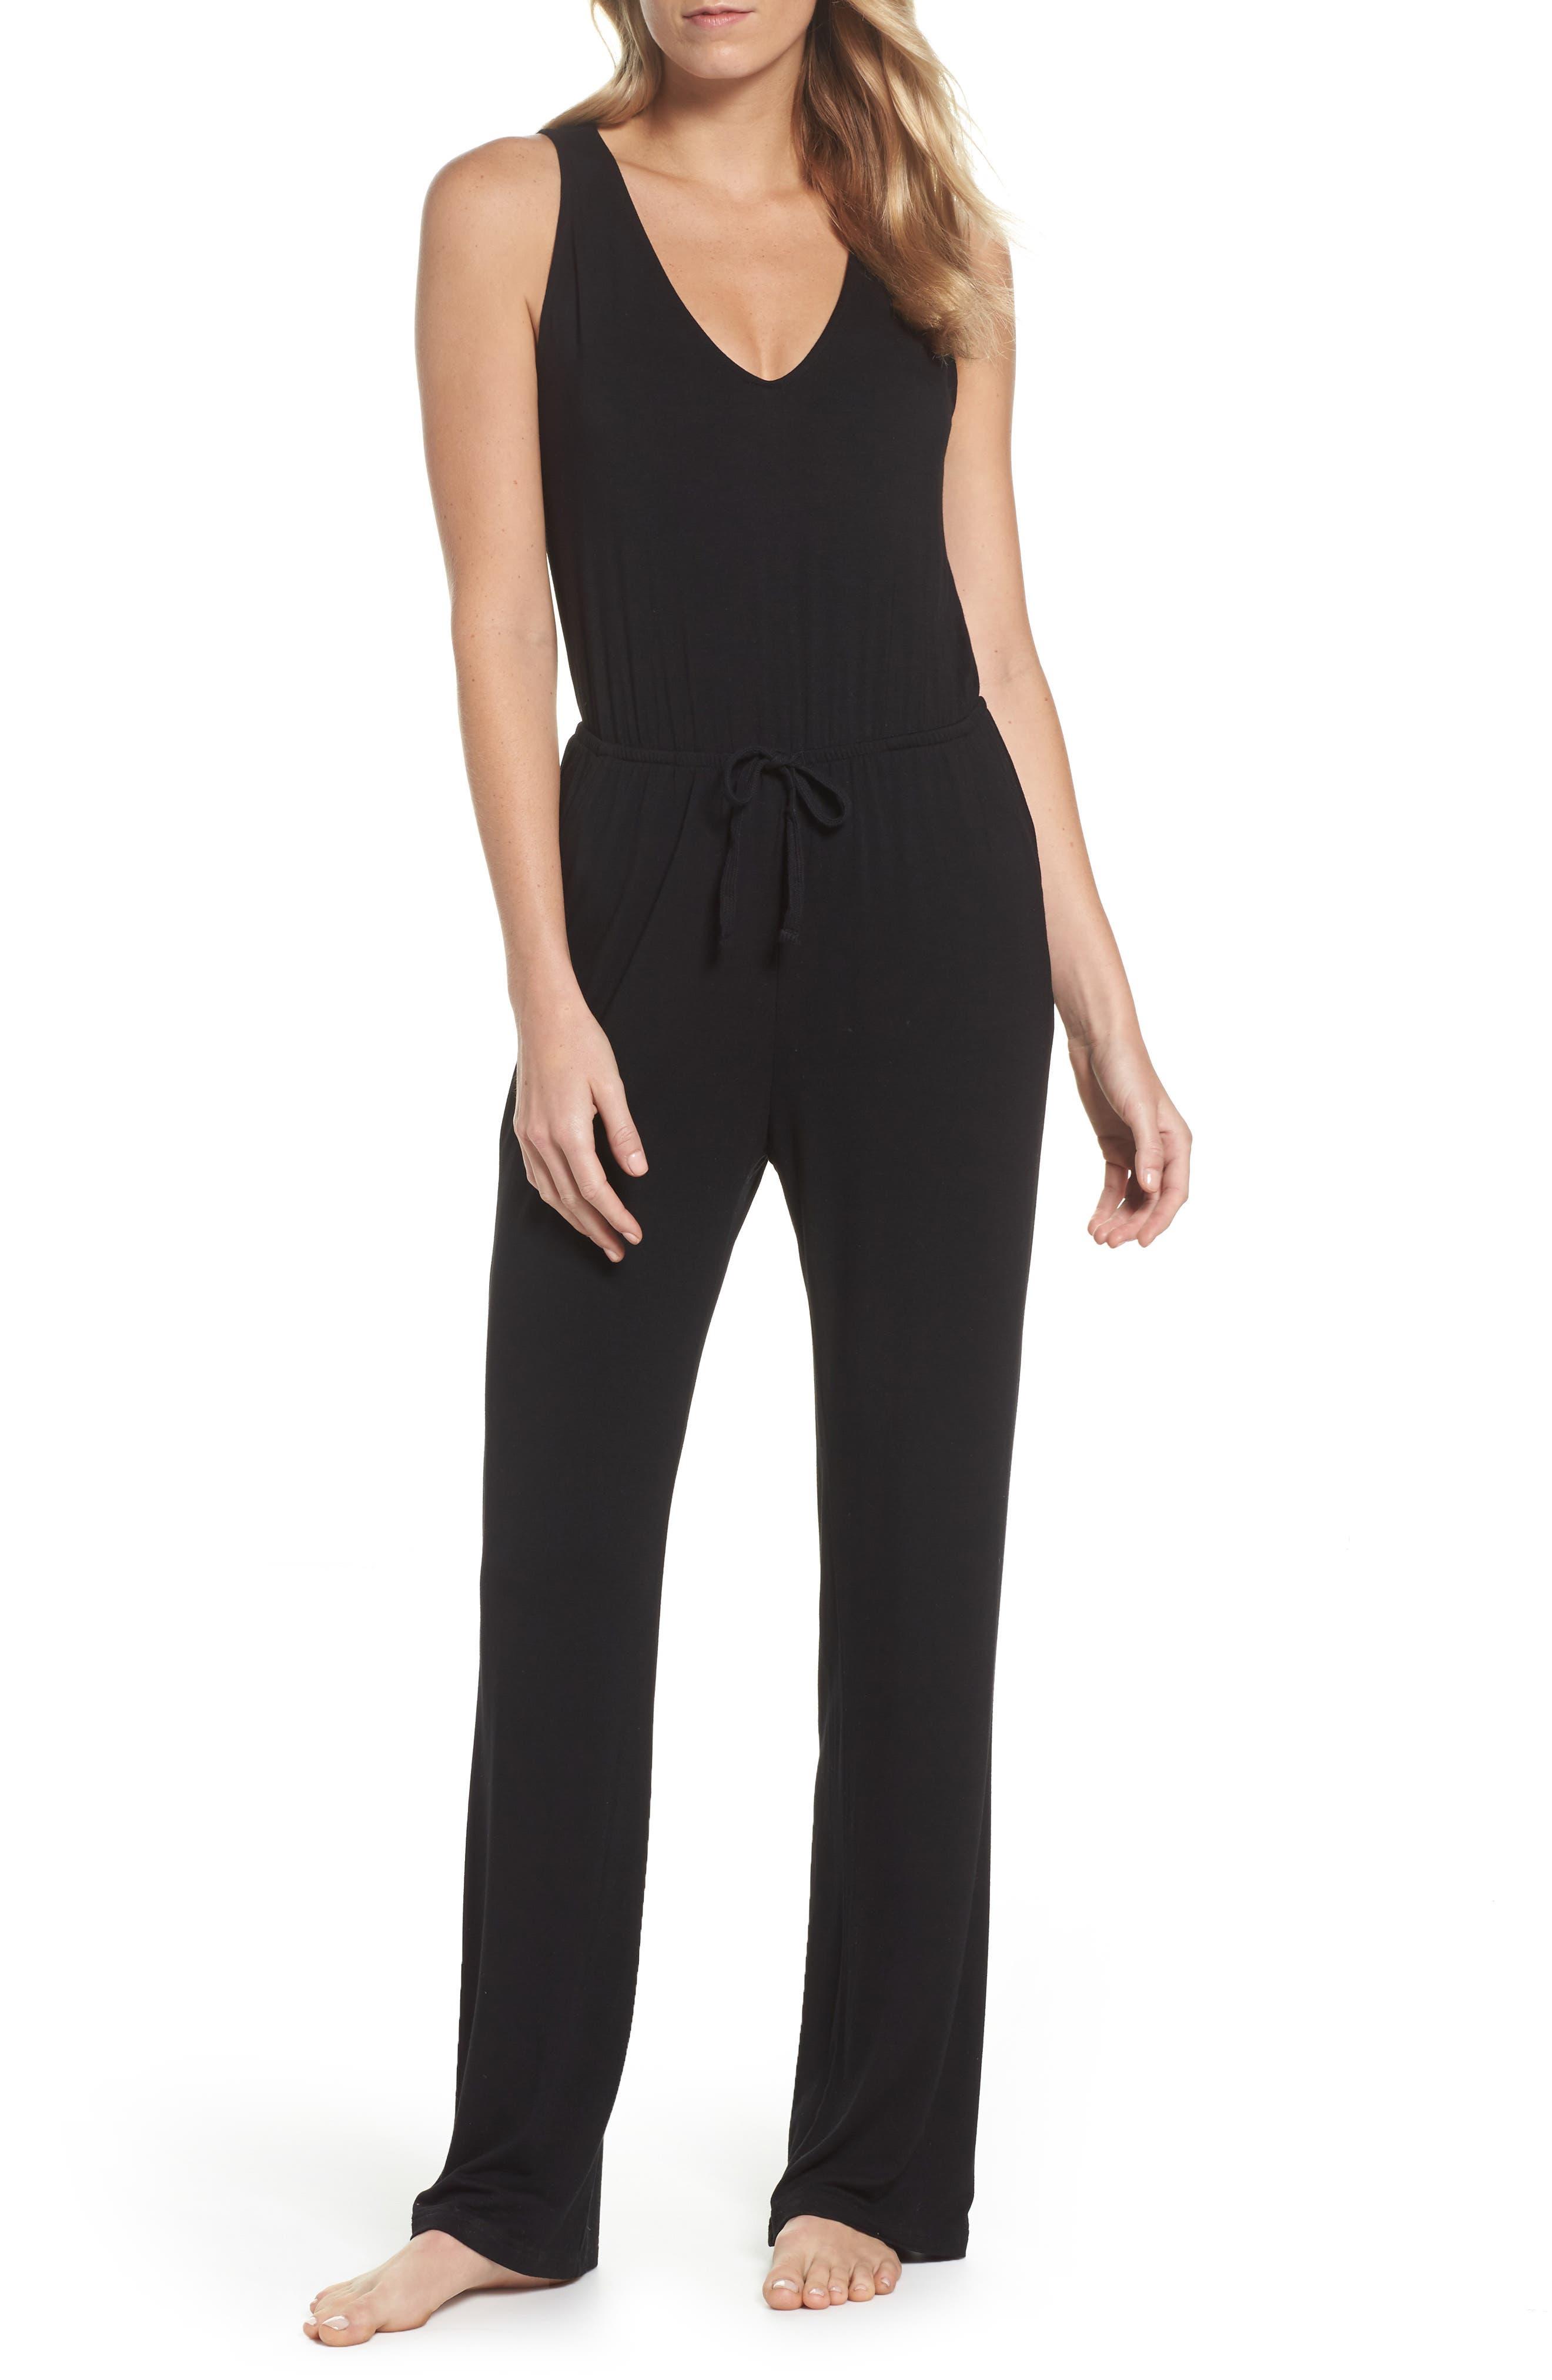 Catalina Knit Lounge Jumpsuit,                         Main,                         color, Black